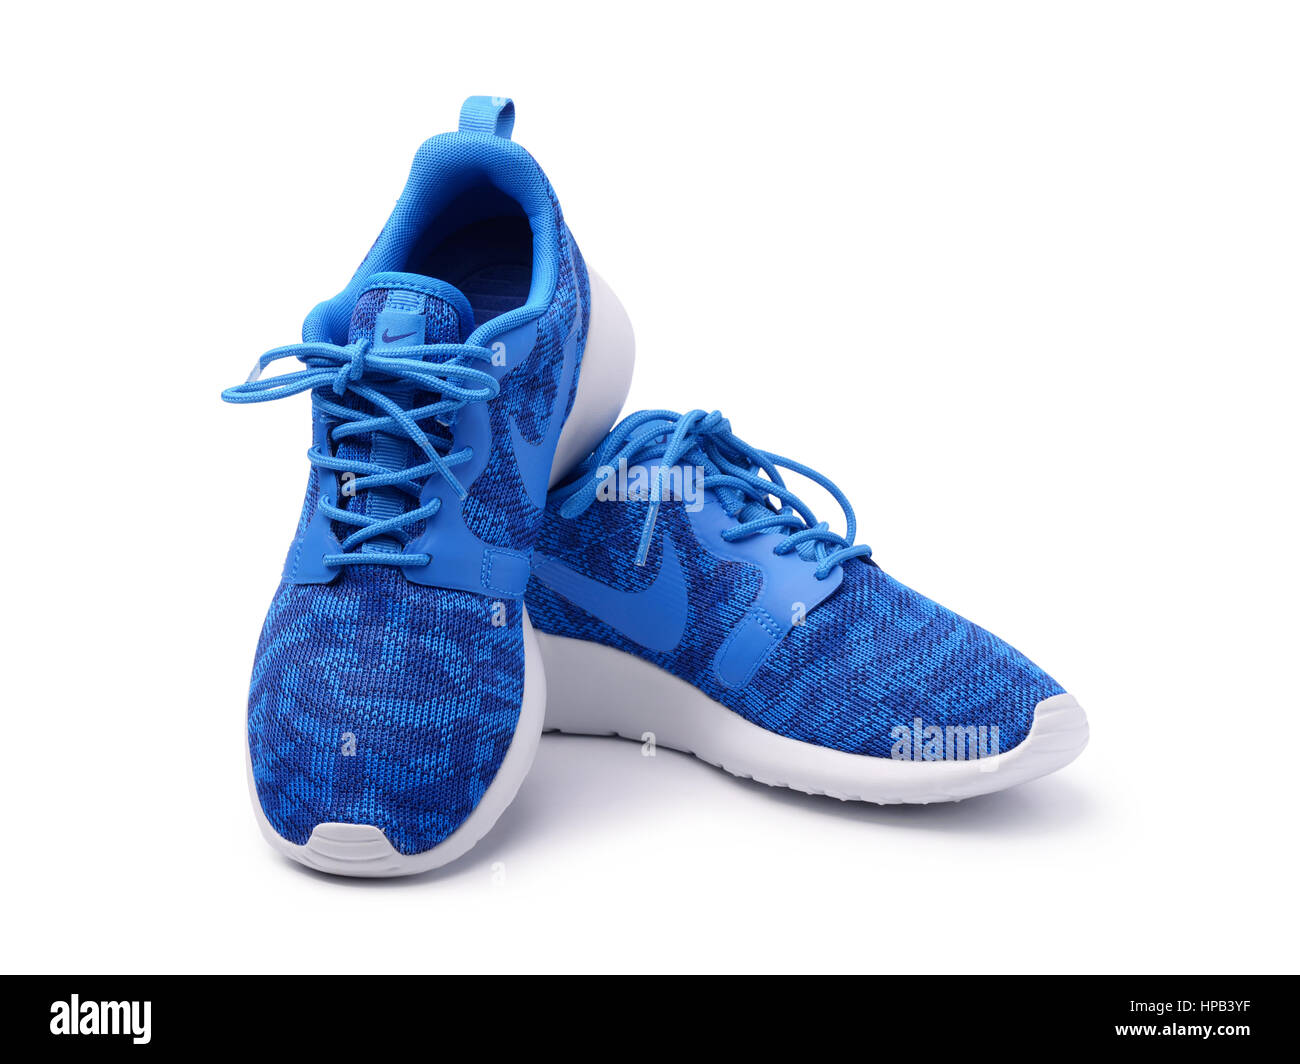 Nike Turnschuhe Stockfotos & Nike Turnschuhe Bilder Alamy